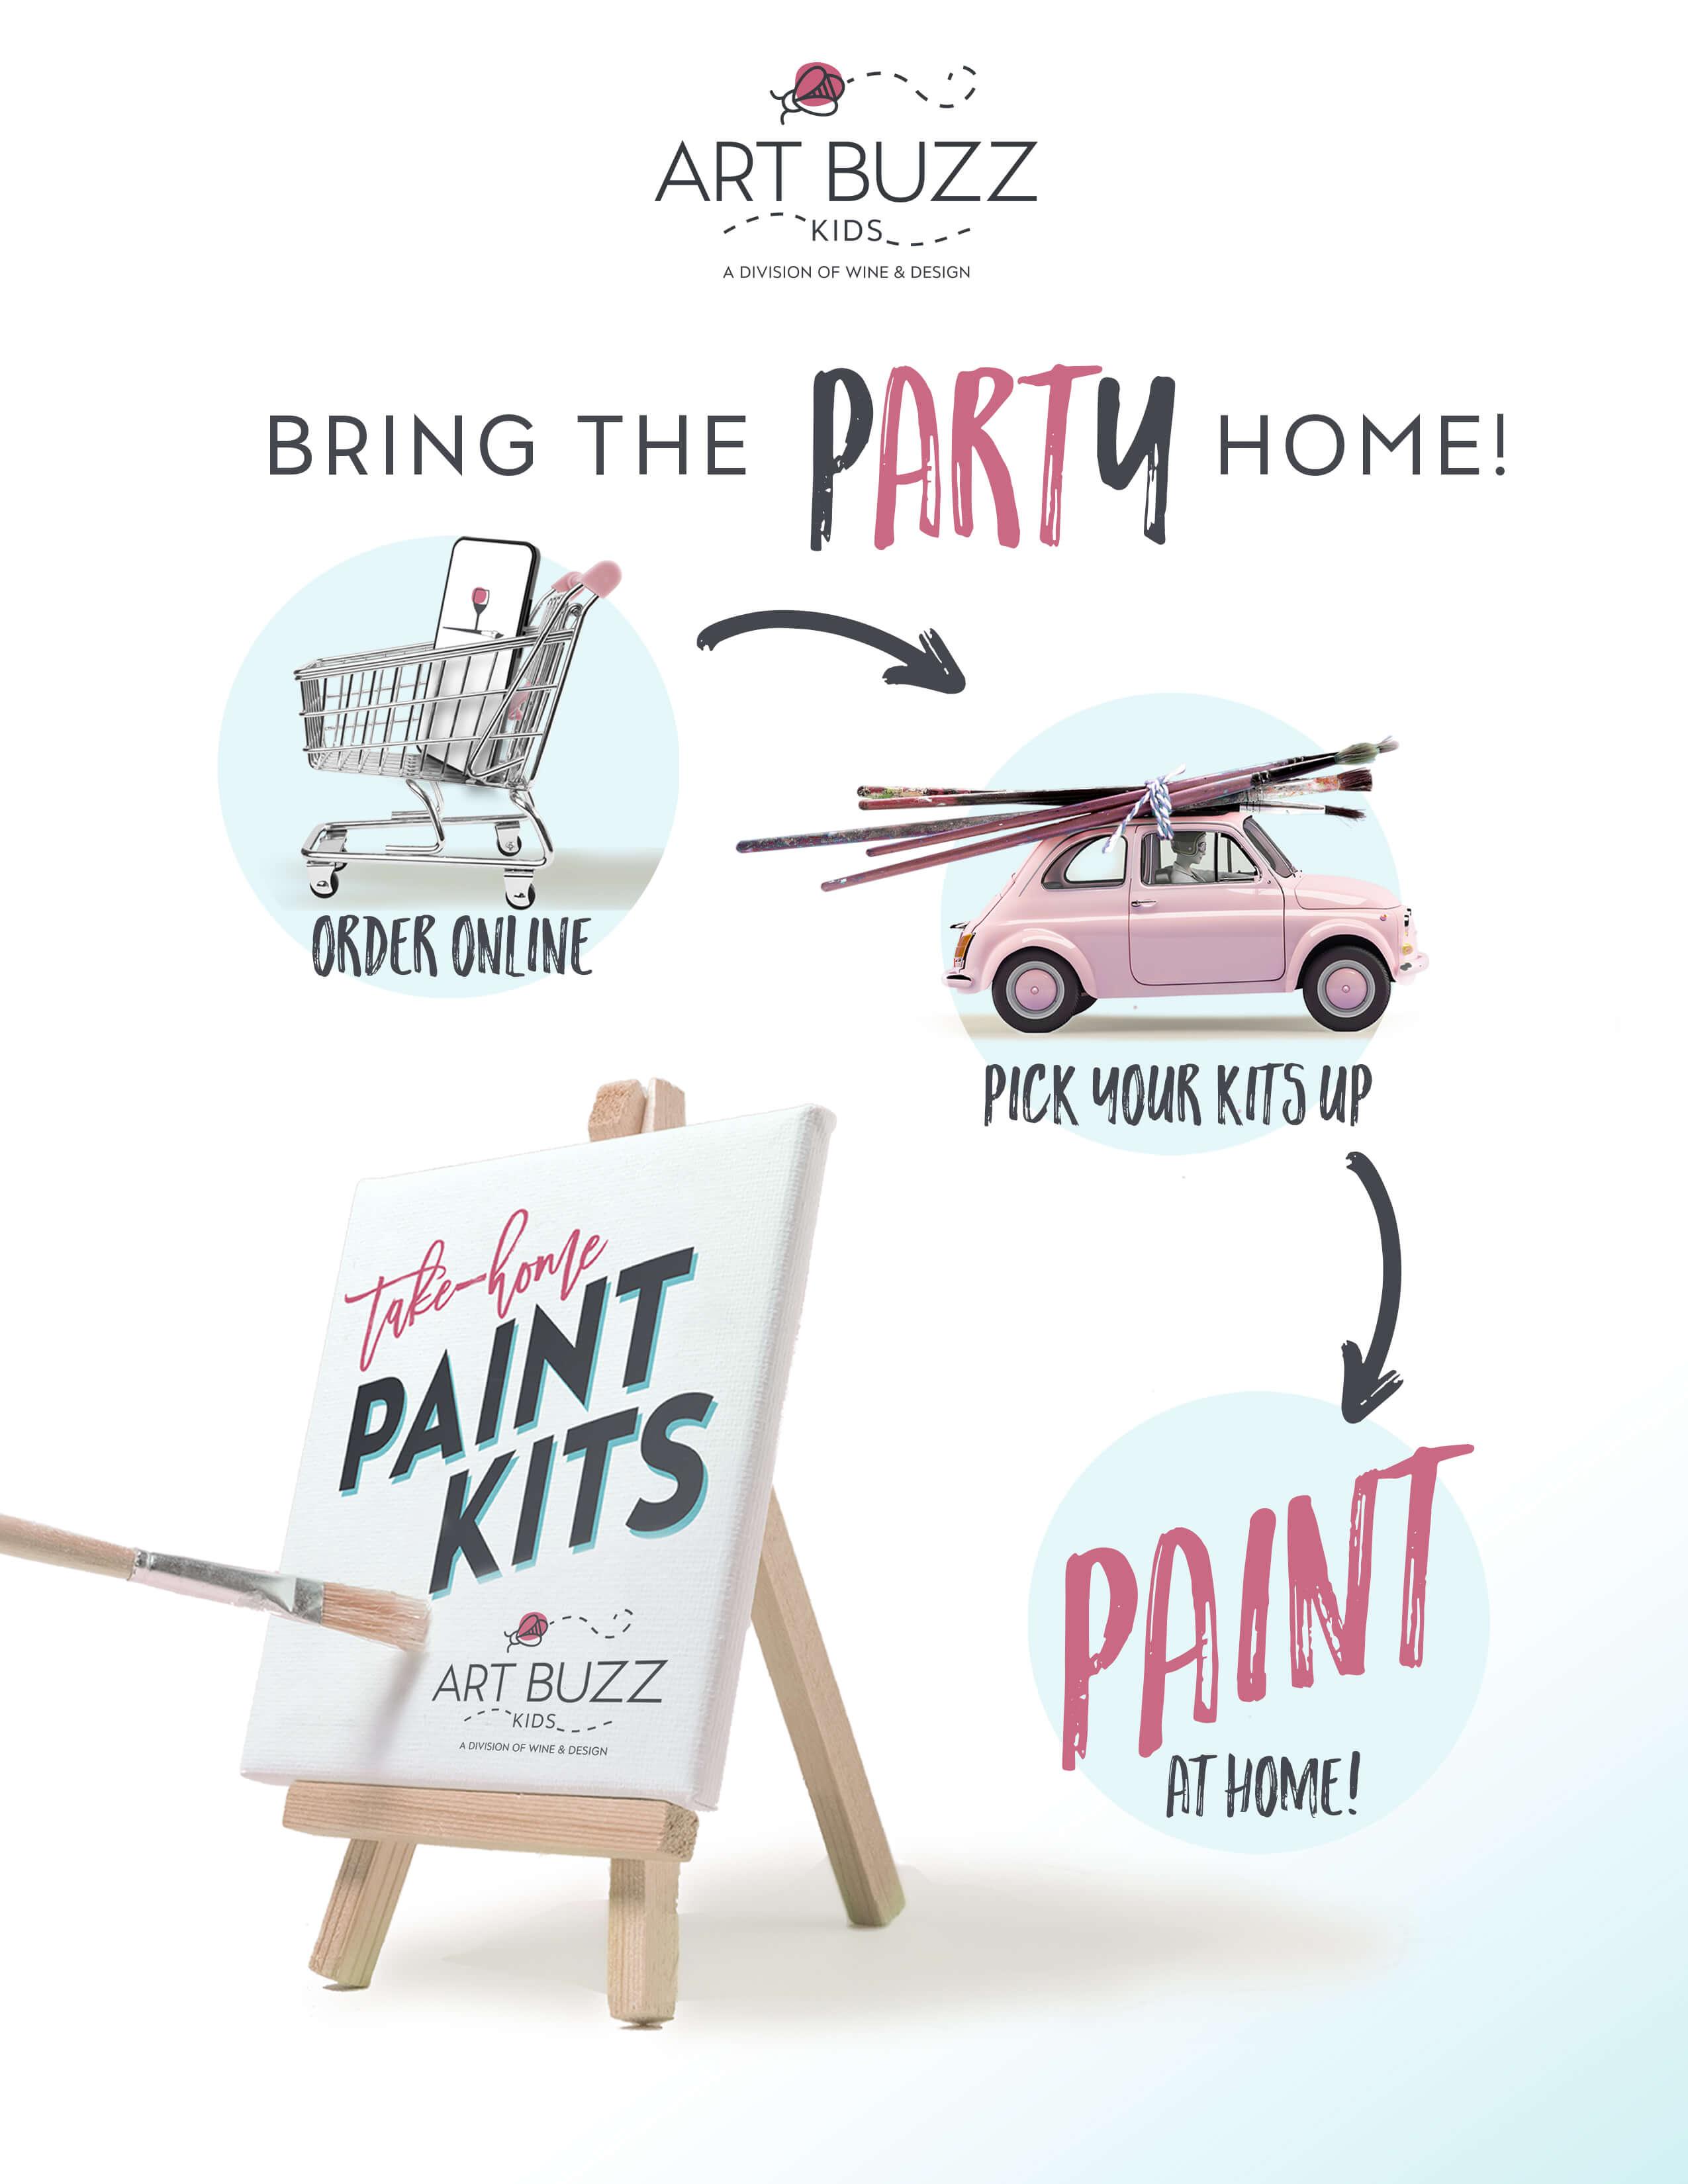 Art Buzz Kids Paint Kit